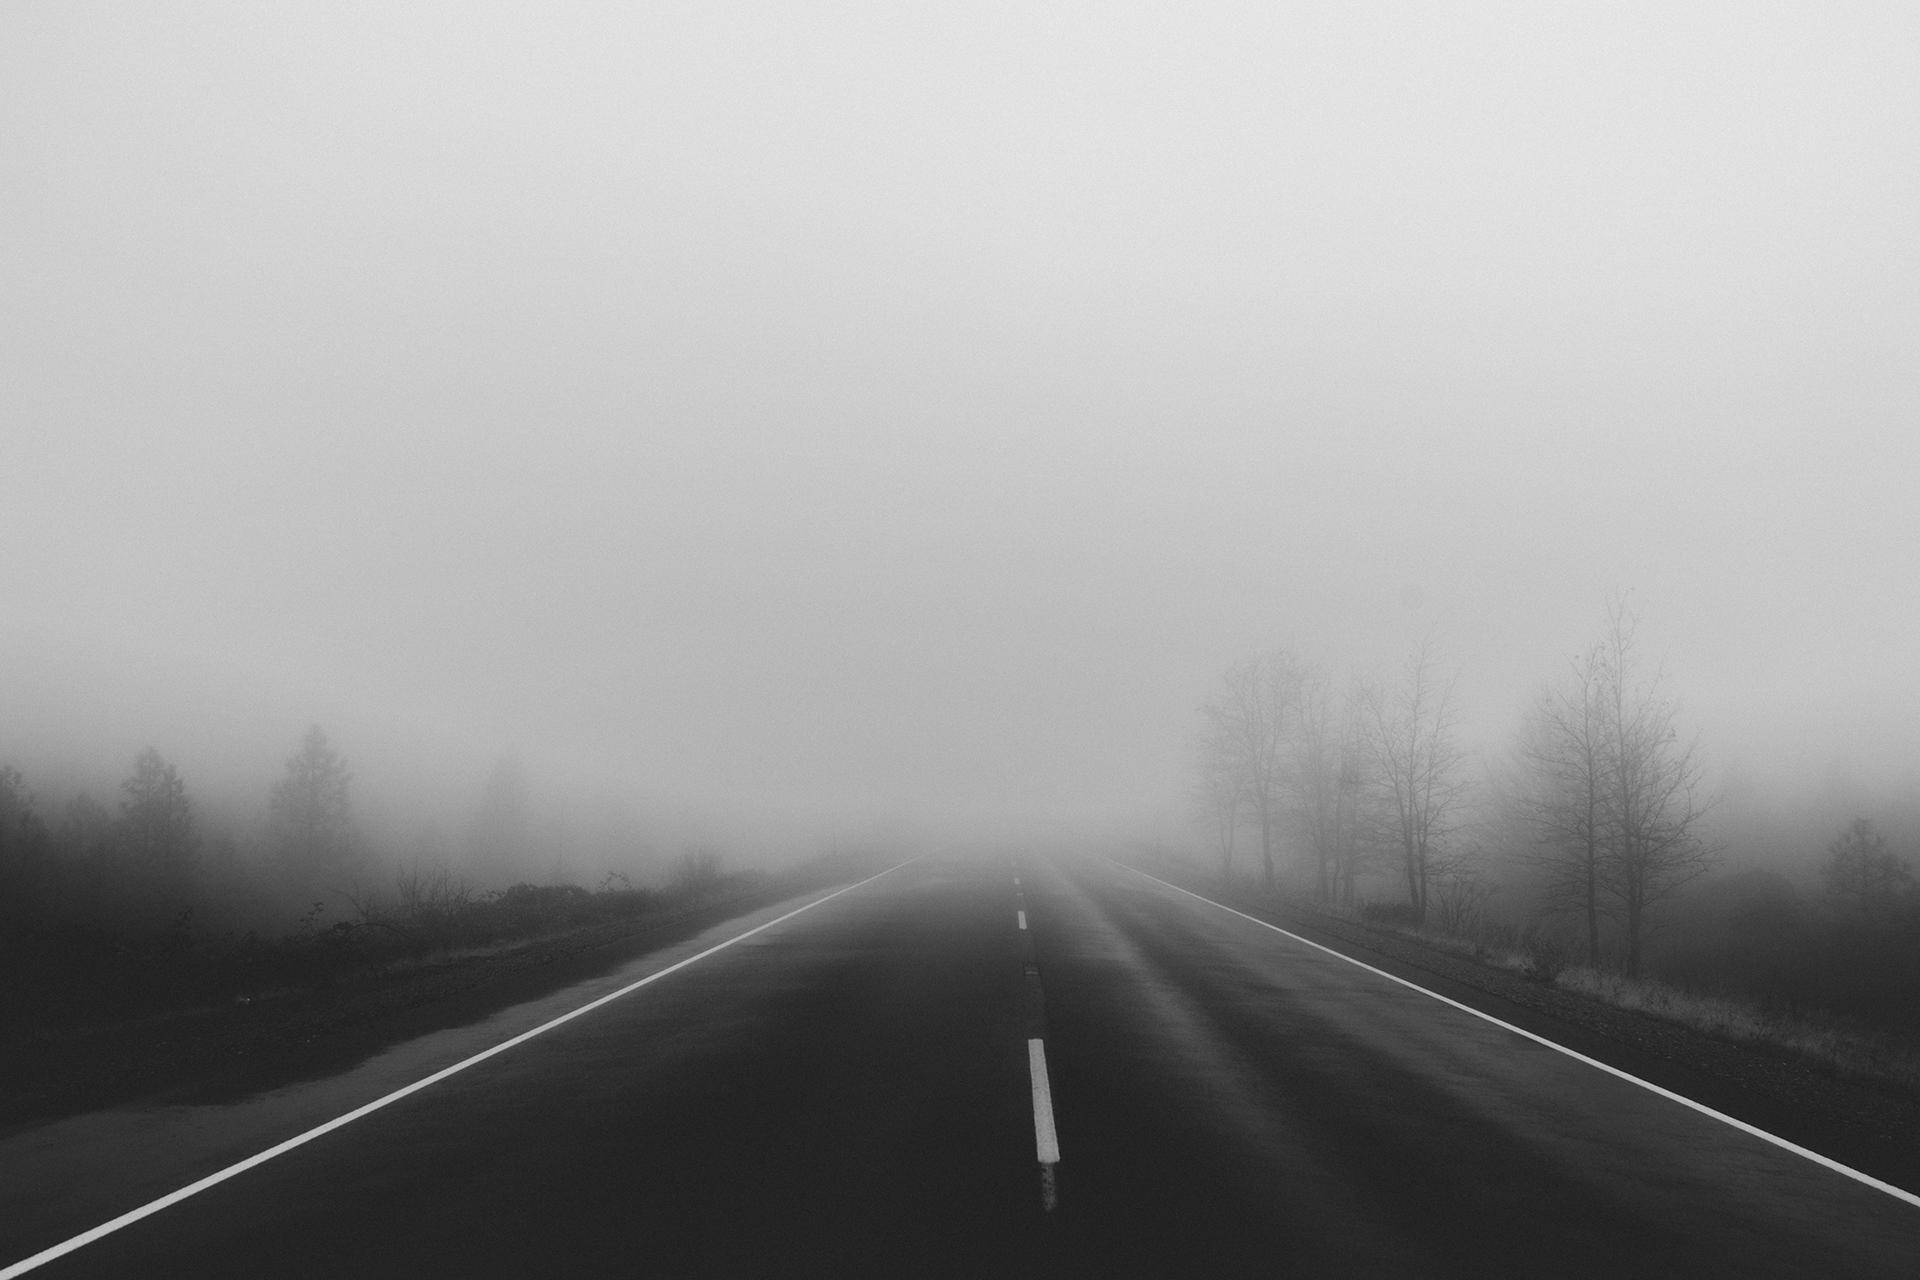 Fog Backgrounds on Wallpapers Vista